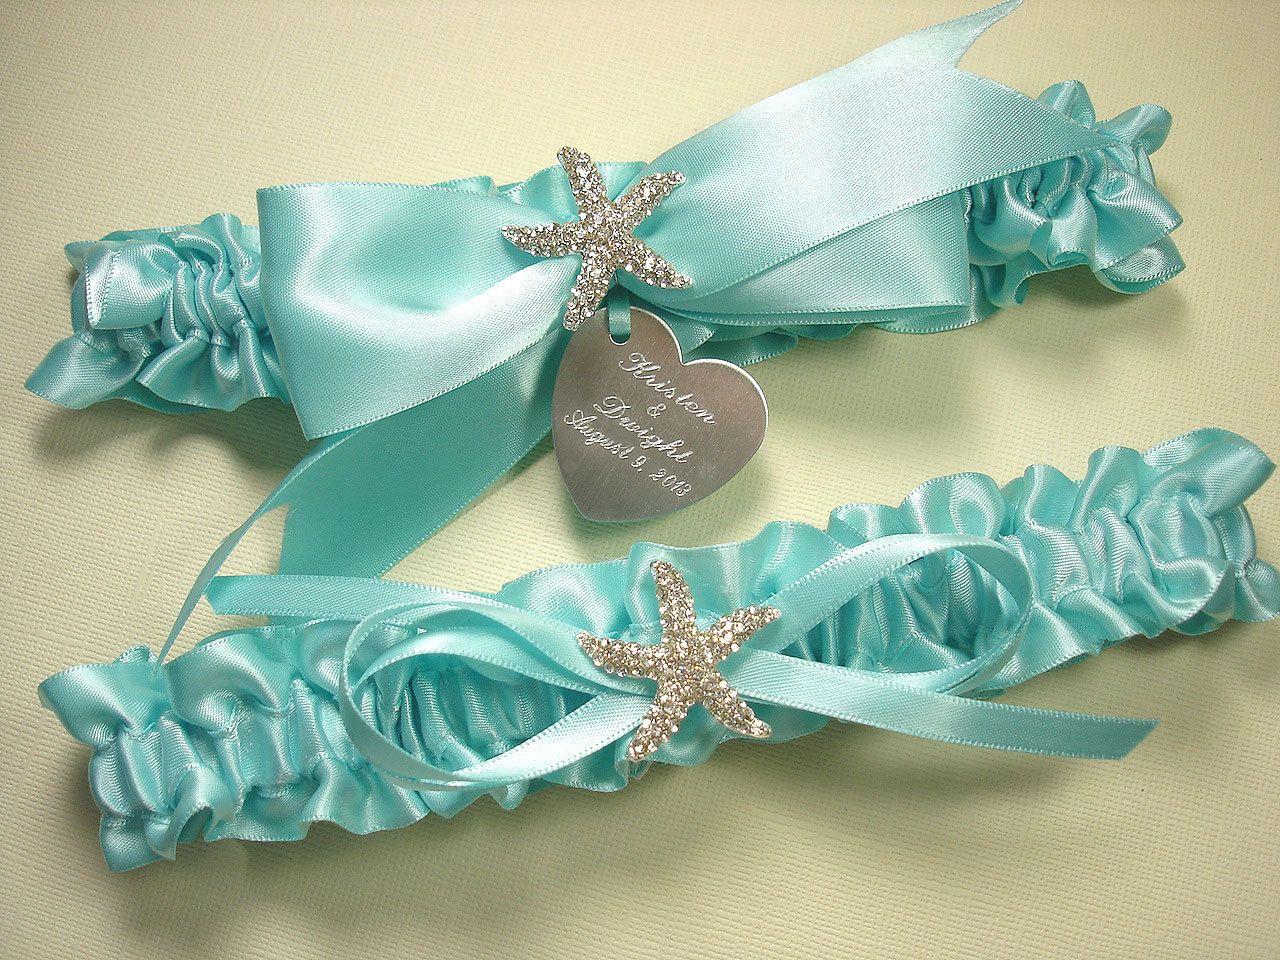 Tiffany Blue Beach Wedding Garter Set Personalized Starfish Garters With Engraving And A Rhinestone